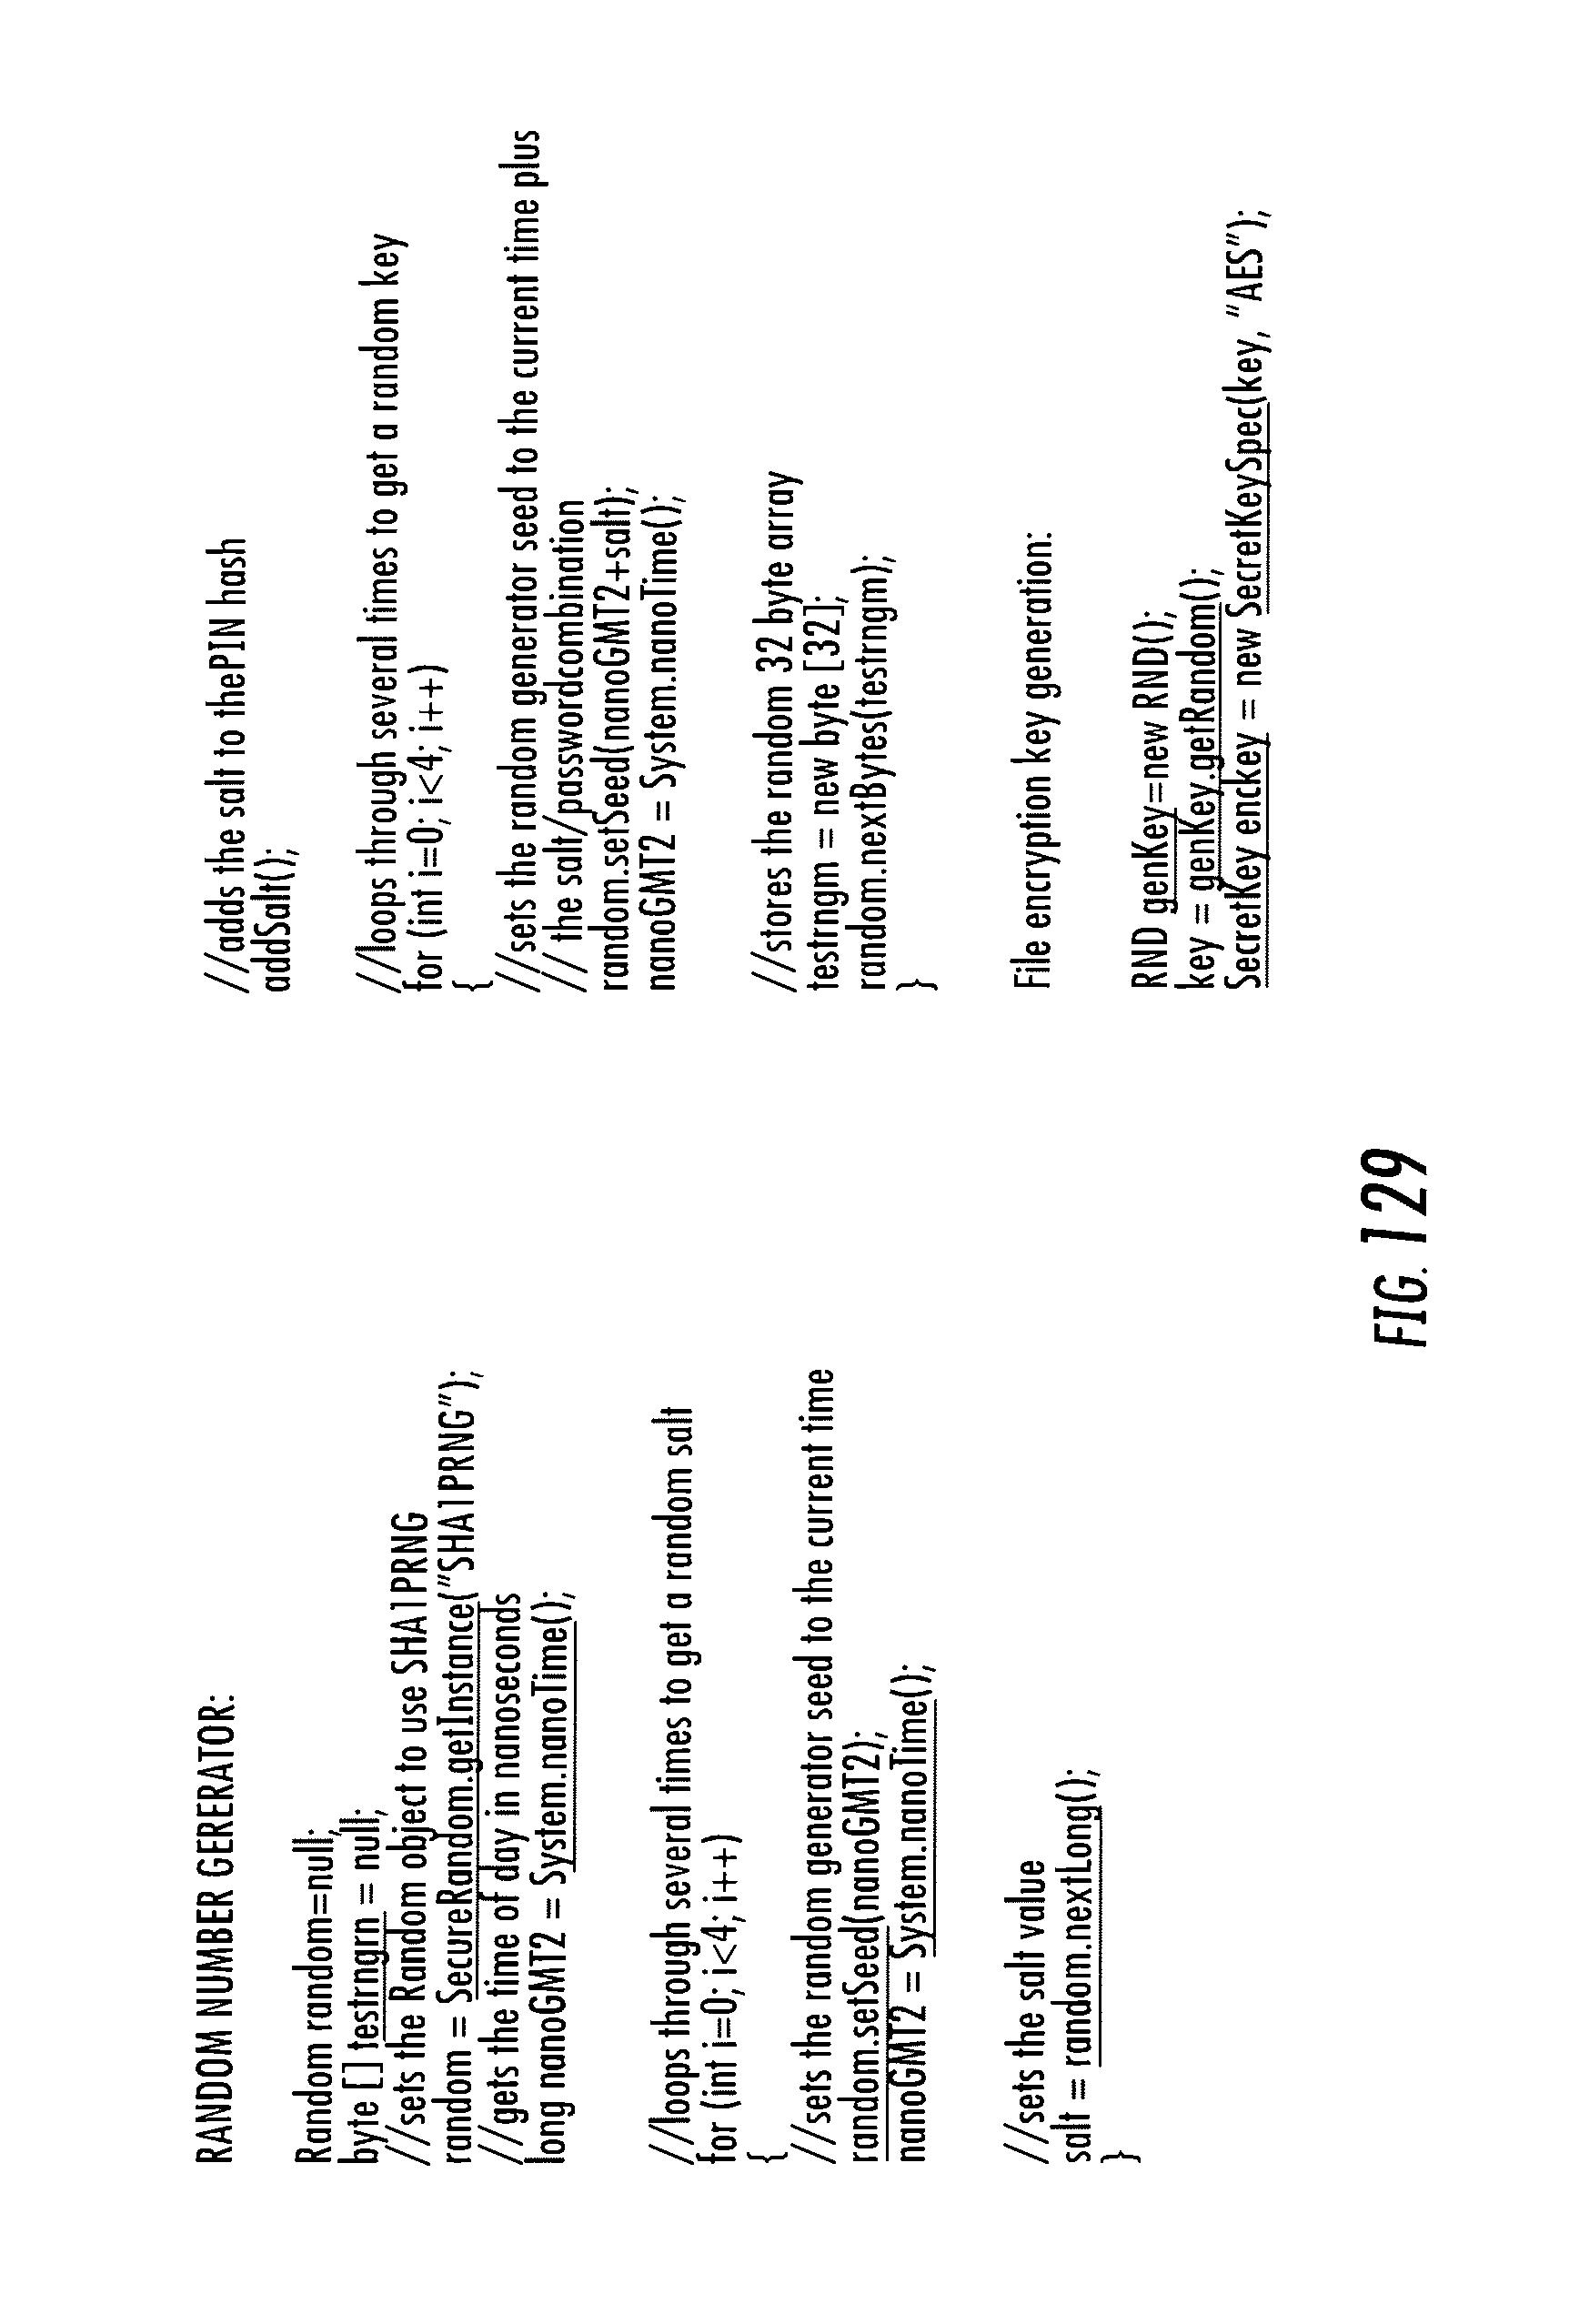 Patent US 9,208,335 B2